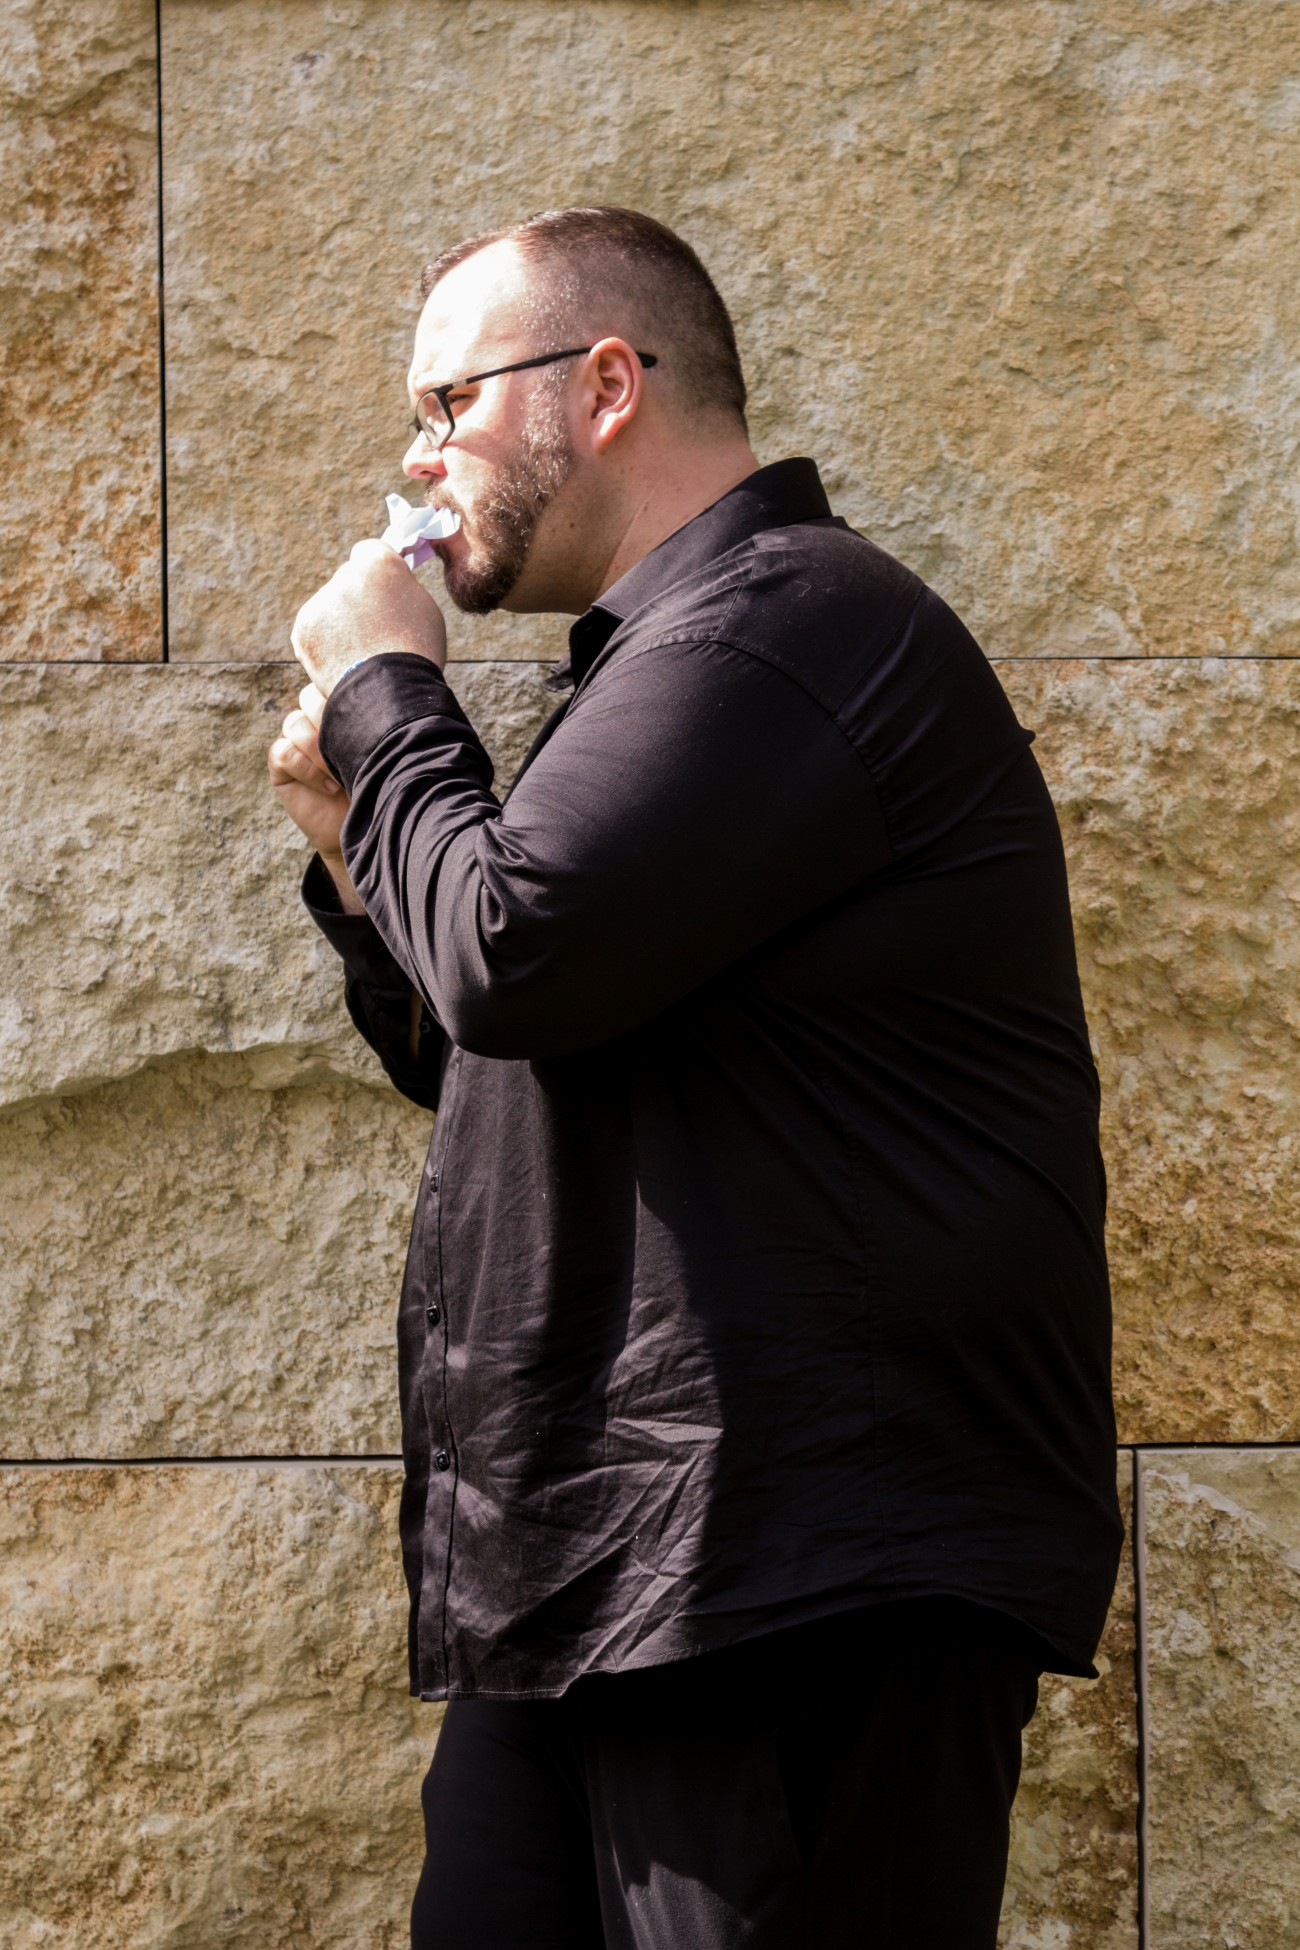 Steve Giasson. Performance invisible n° 116 (Manquer de mots). D'après Keith Arnatt. Art as an Act of Retraction. 1971. Performeur : Steve Giasson. Crédit photographique : Martin Vinette. I.G.-Farben-Haus, Goethe-Universität Frankfurt am Main. 21 mai 2016.